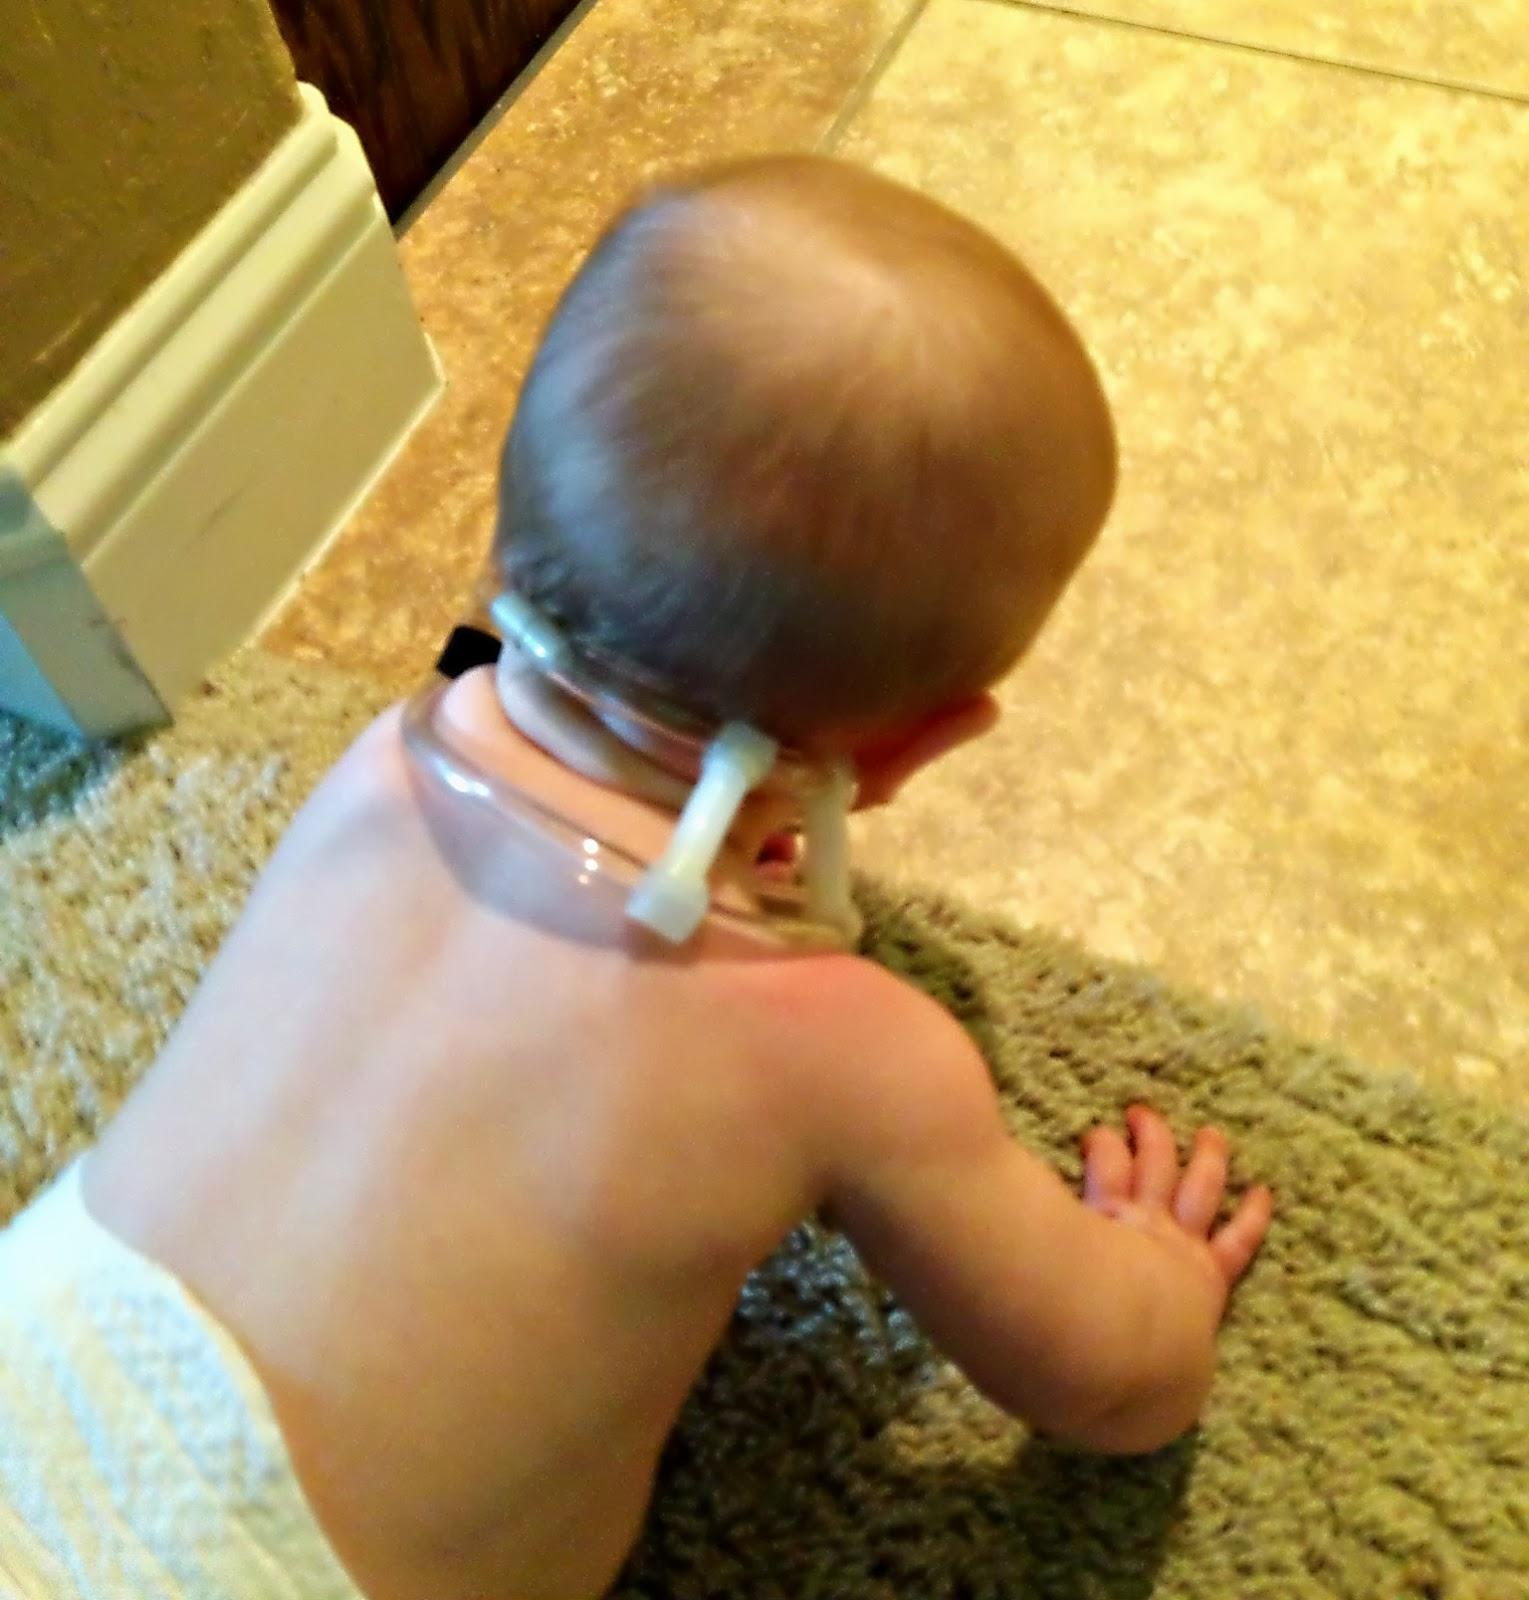 Кривошея у трехмесячного ребенка фото